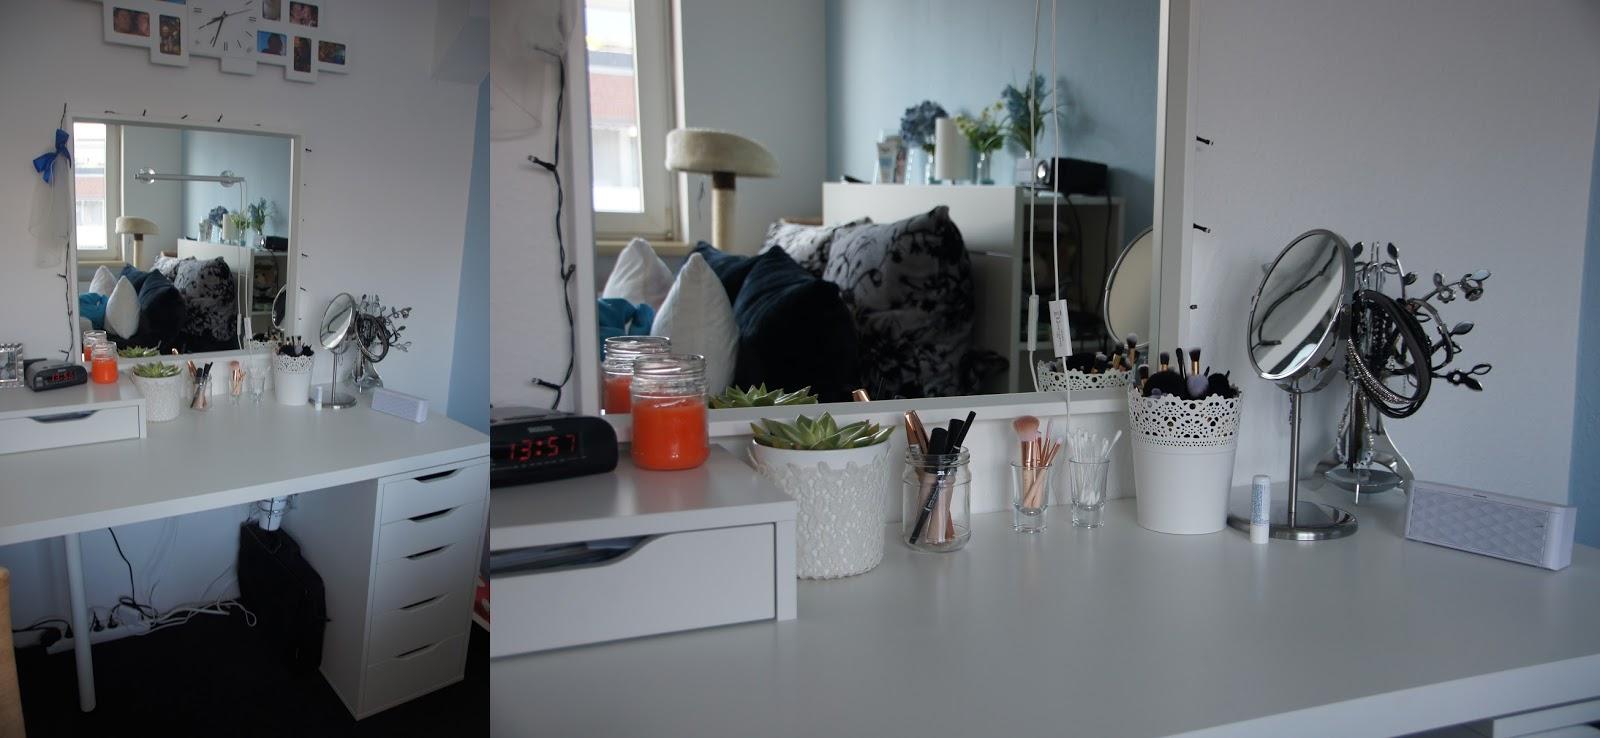 daily life mein schmuckst ck teil 1. Black Bedroom Furniture Sets. Home Design Ideas